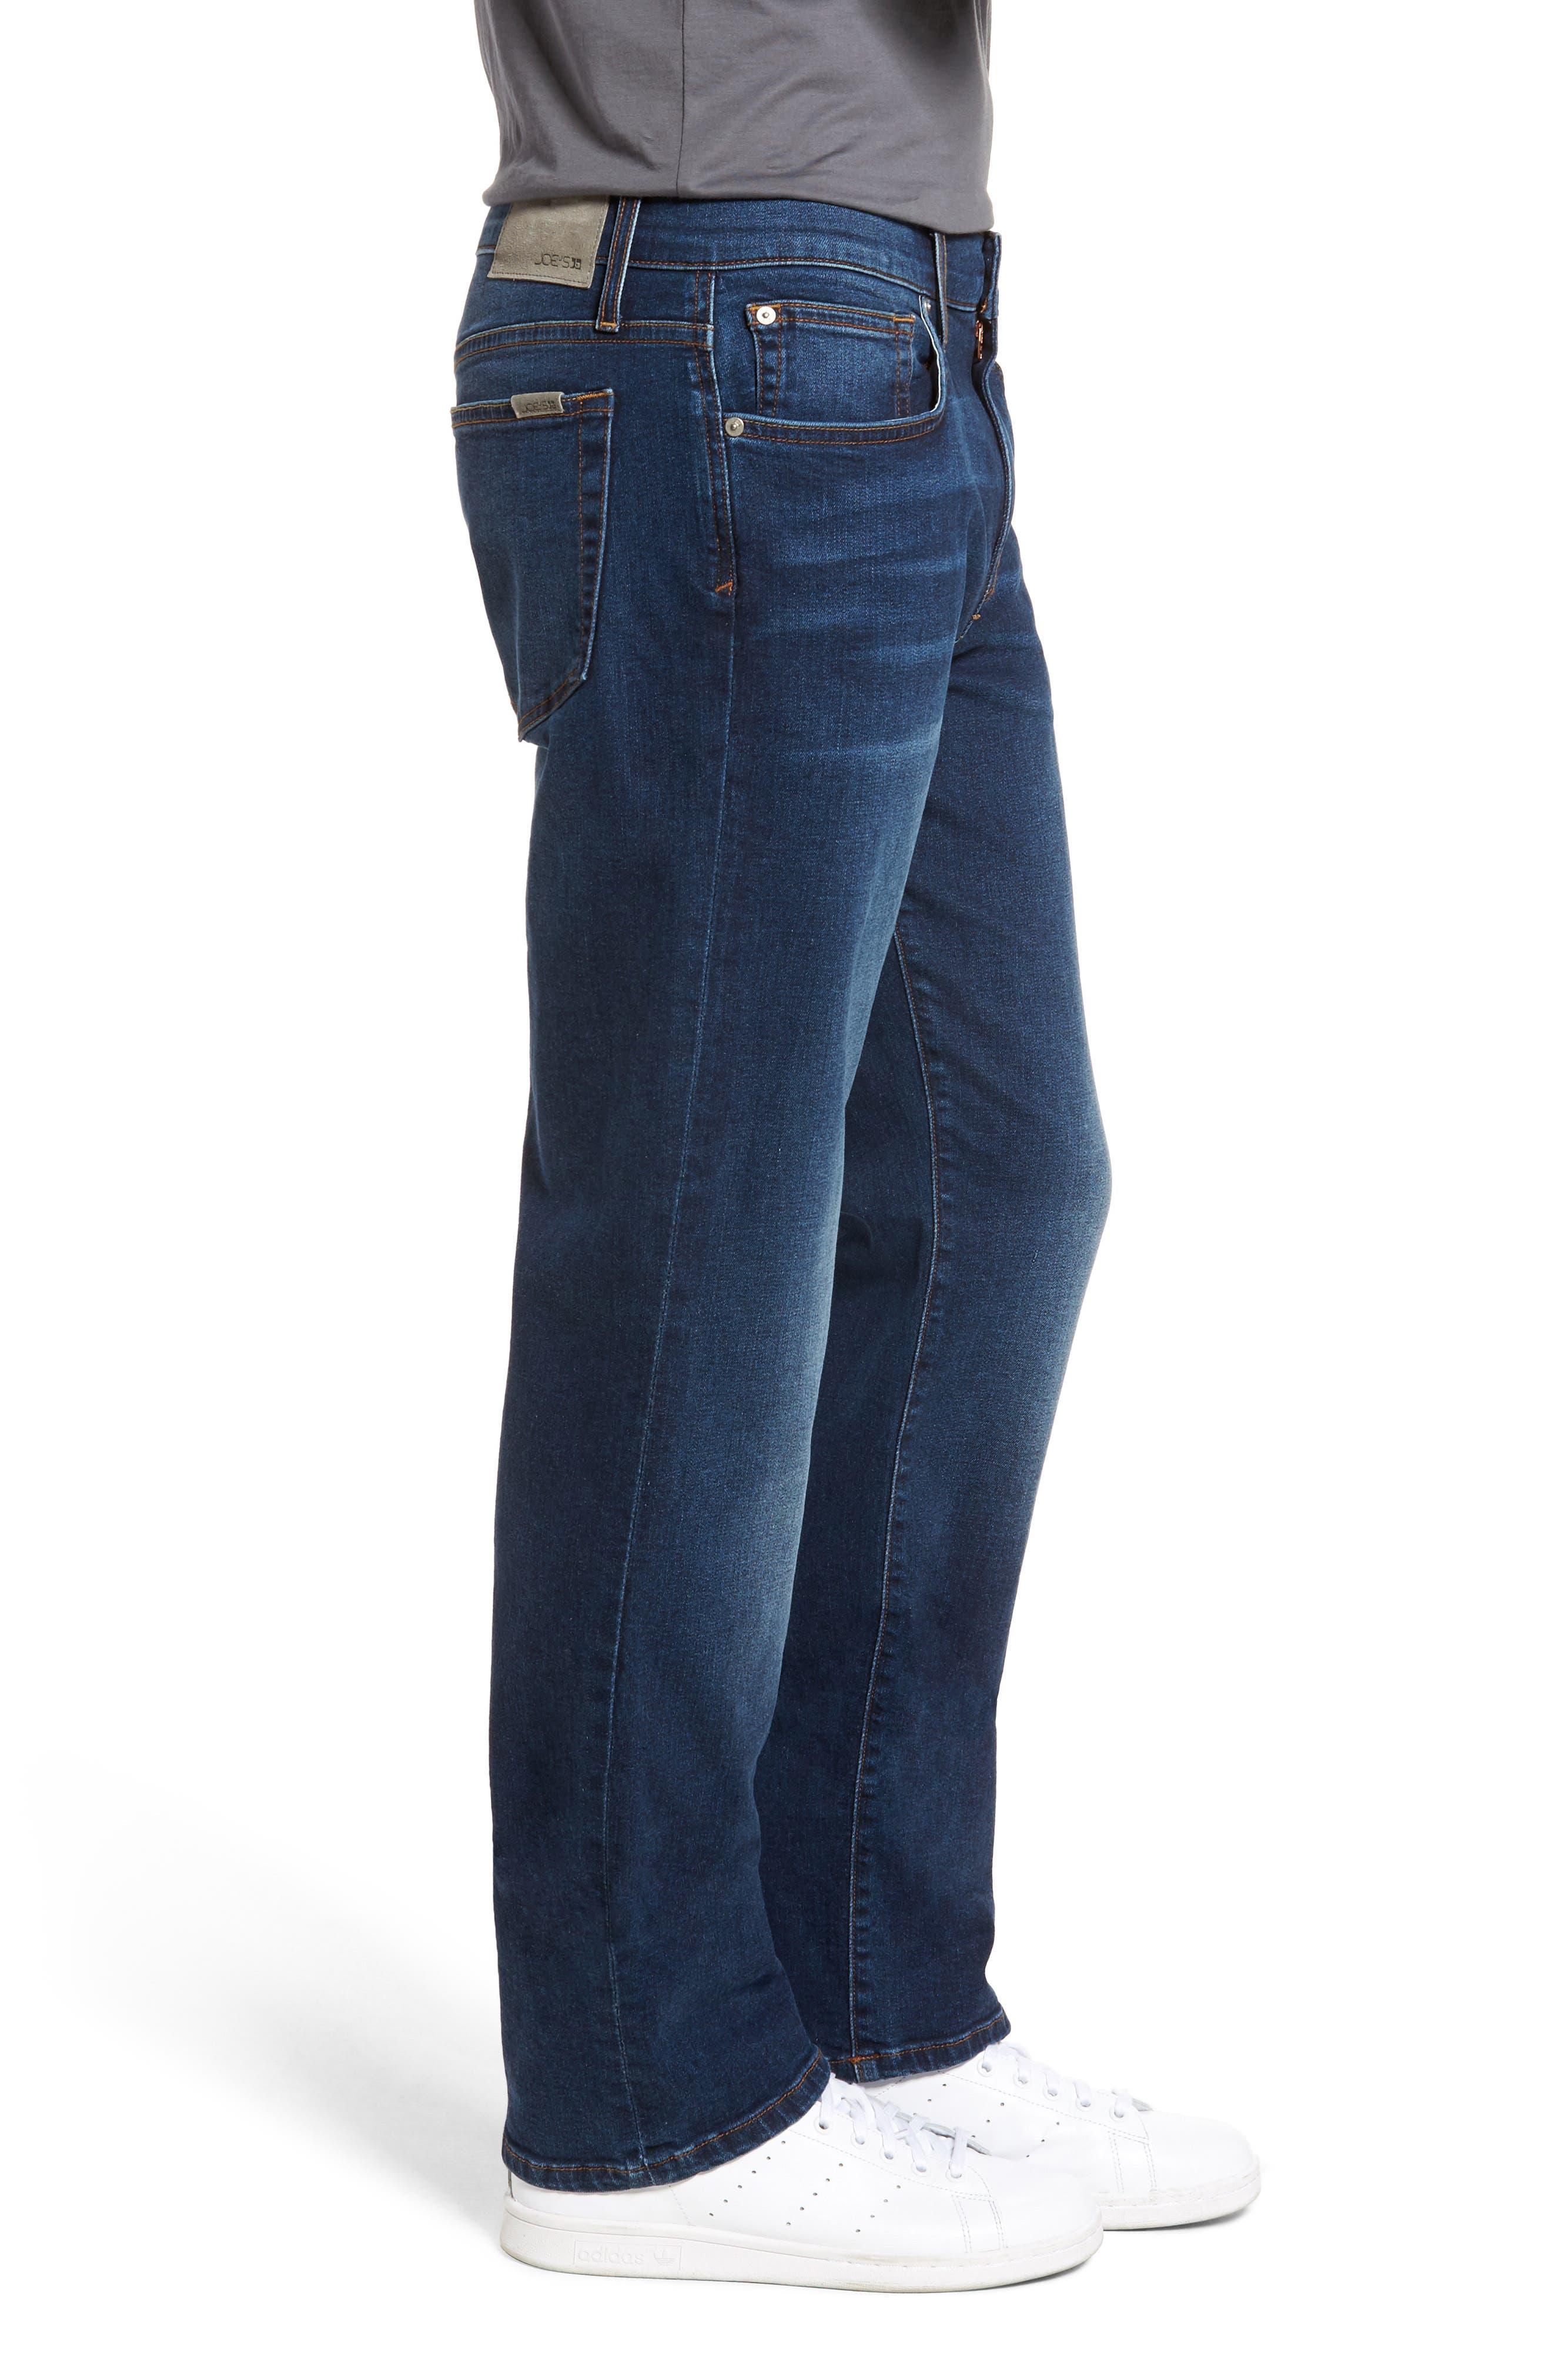 Brixton Slim Straight Leg Jeans,                             Alternate thumbnail 3, color,                             Line